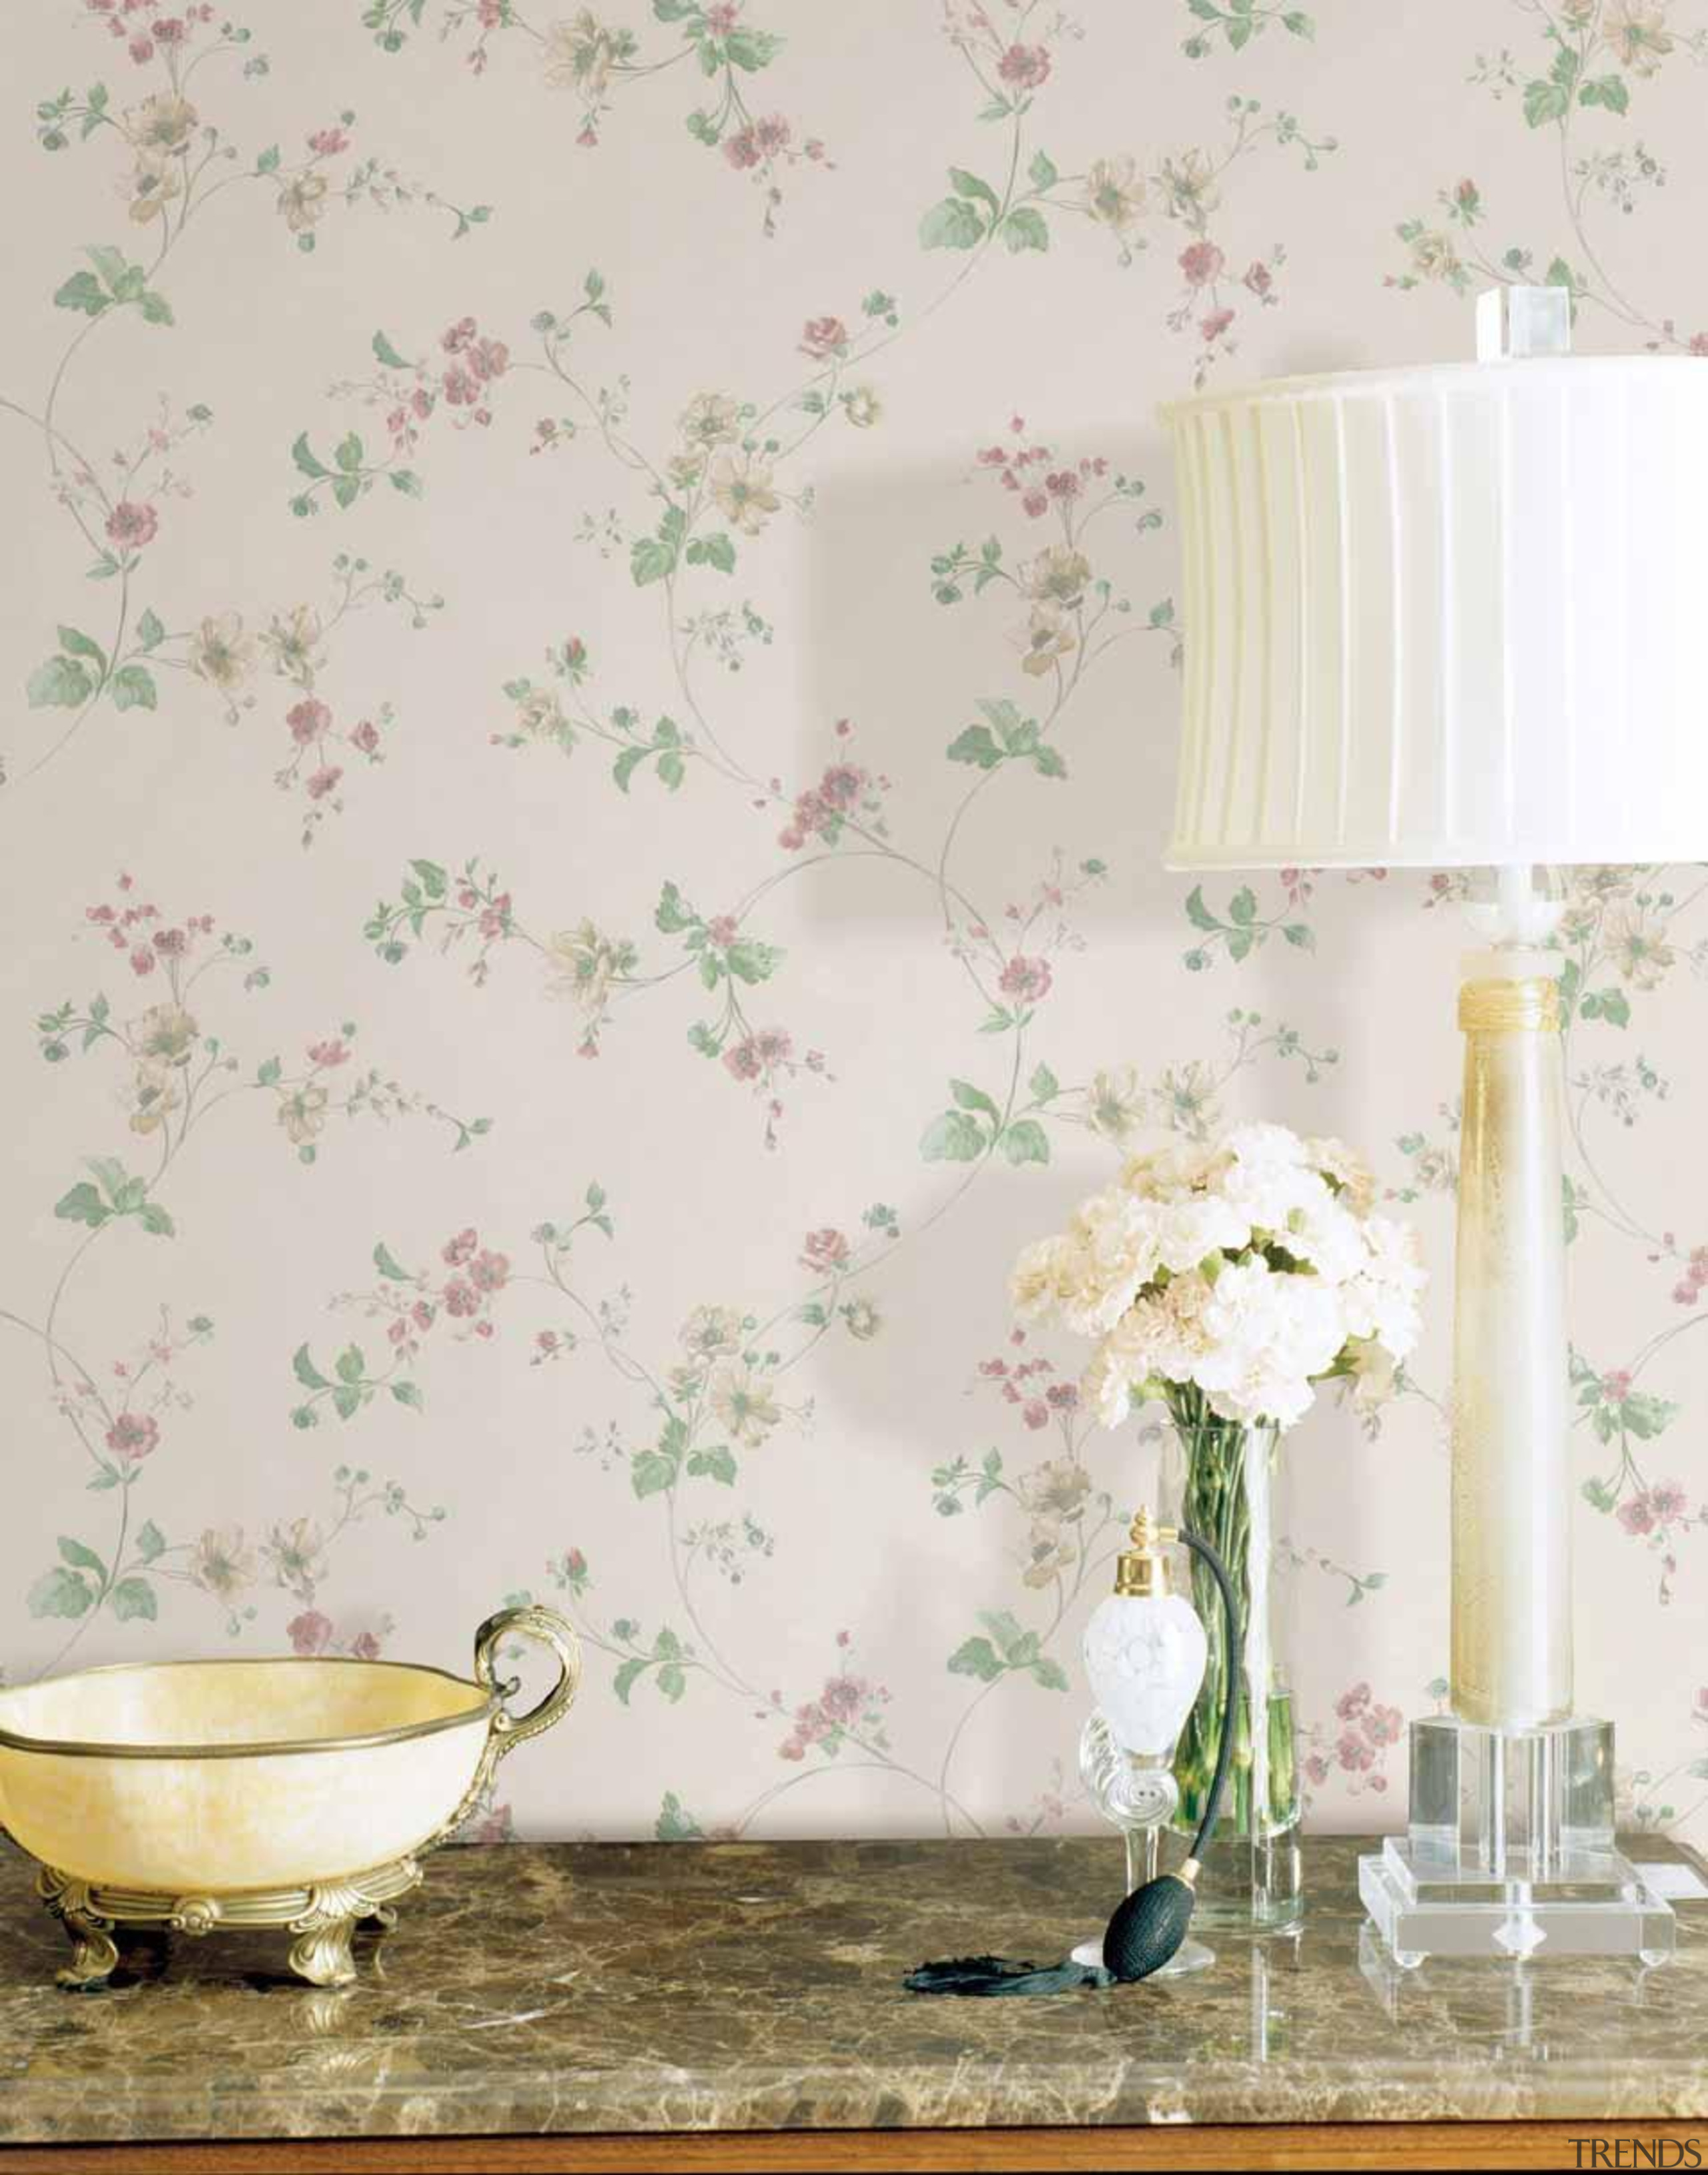 Saphyr II Range - ceramic | decor | ceramic, decor, interior design, wall, wallpaper, white